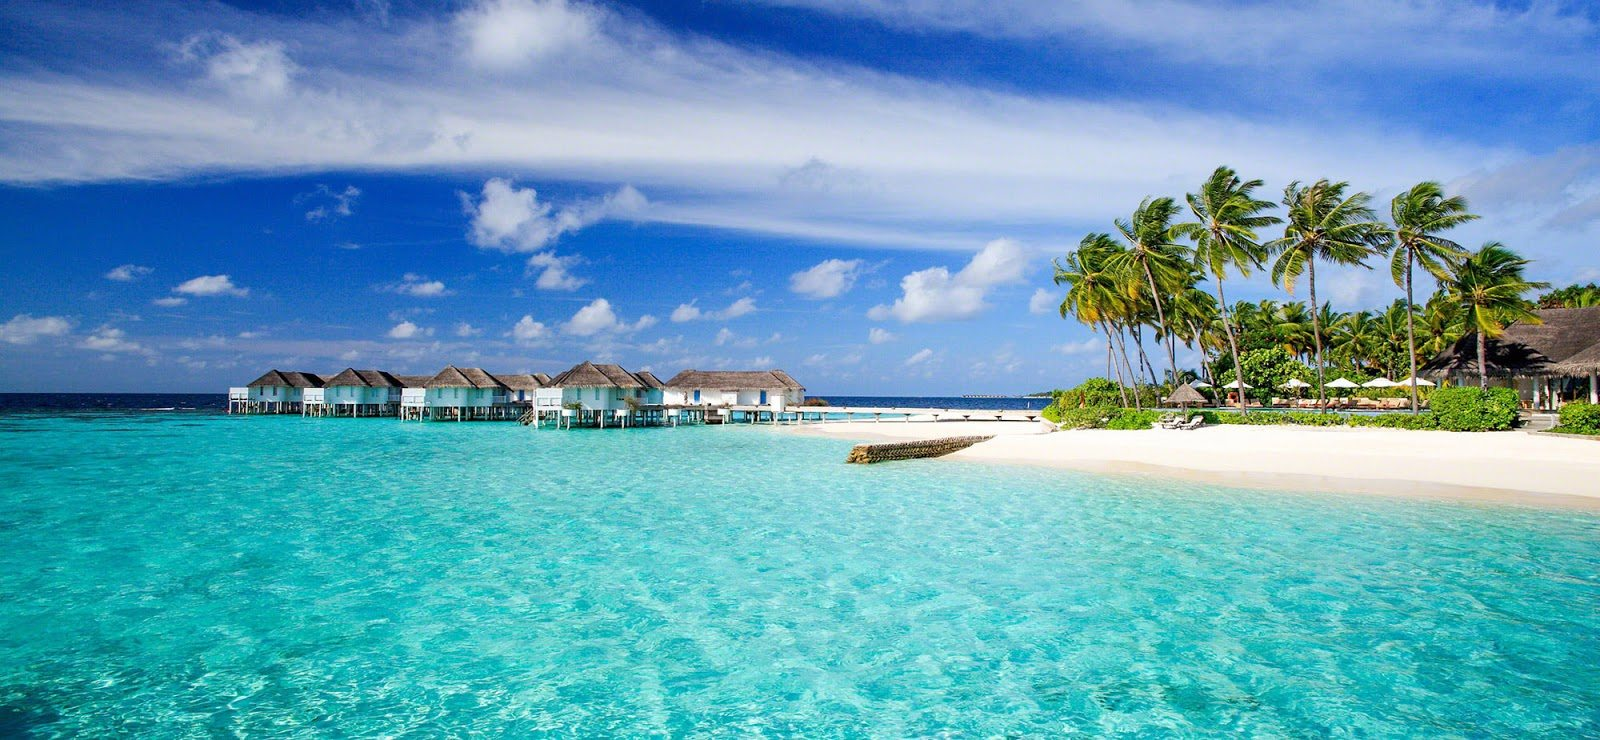 Tourism to the Maldives